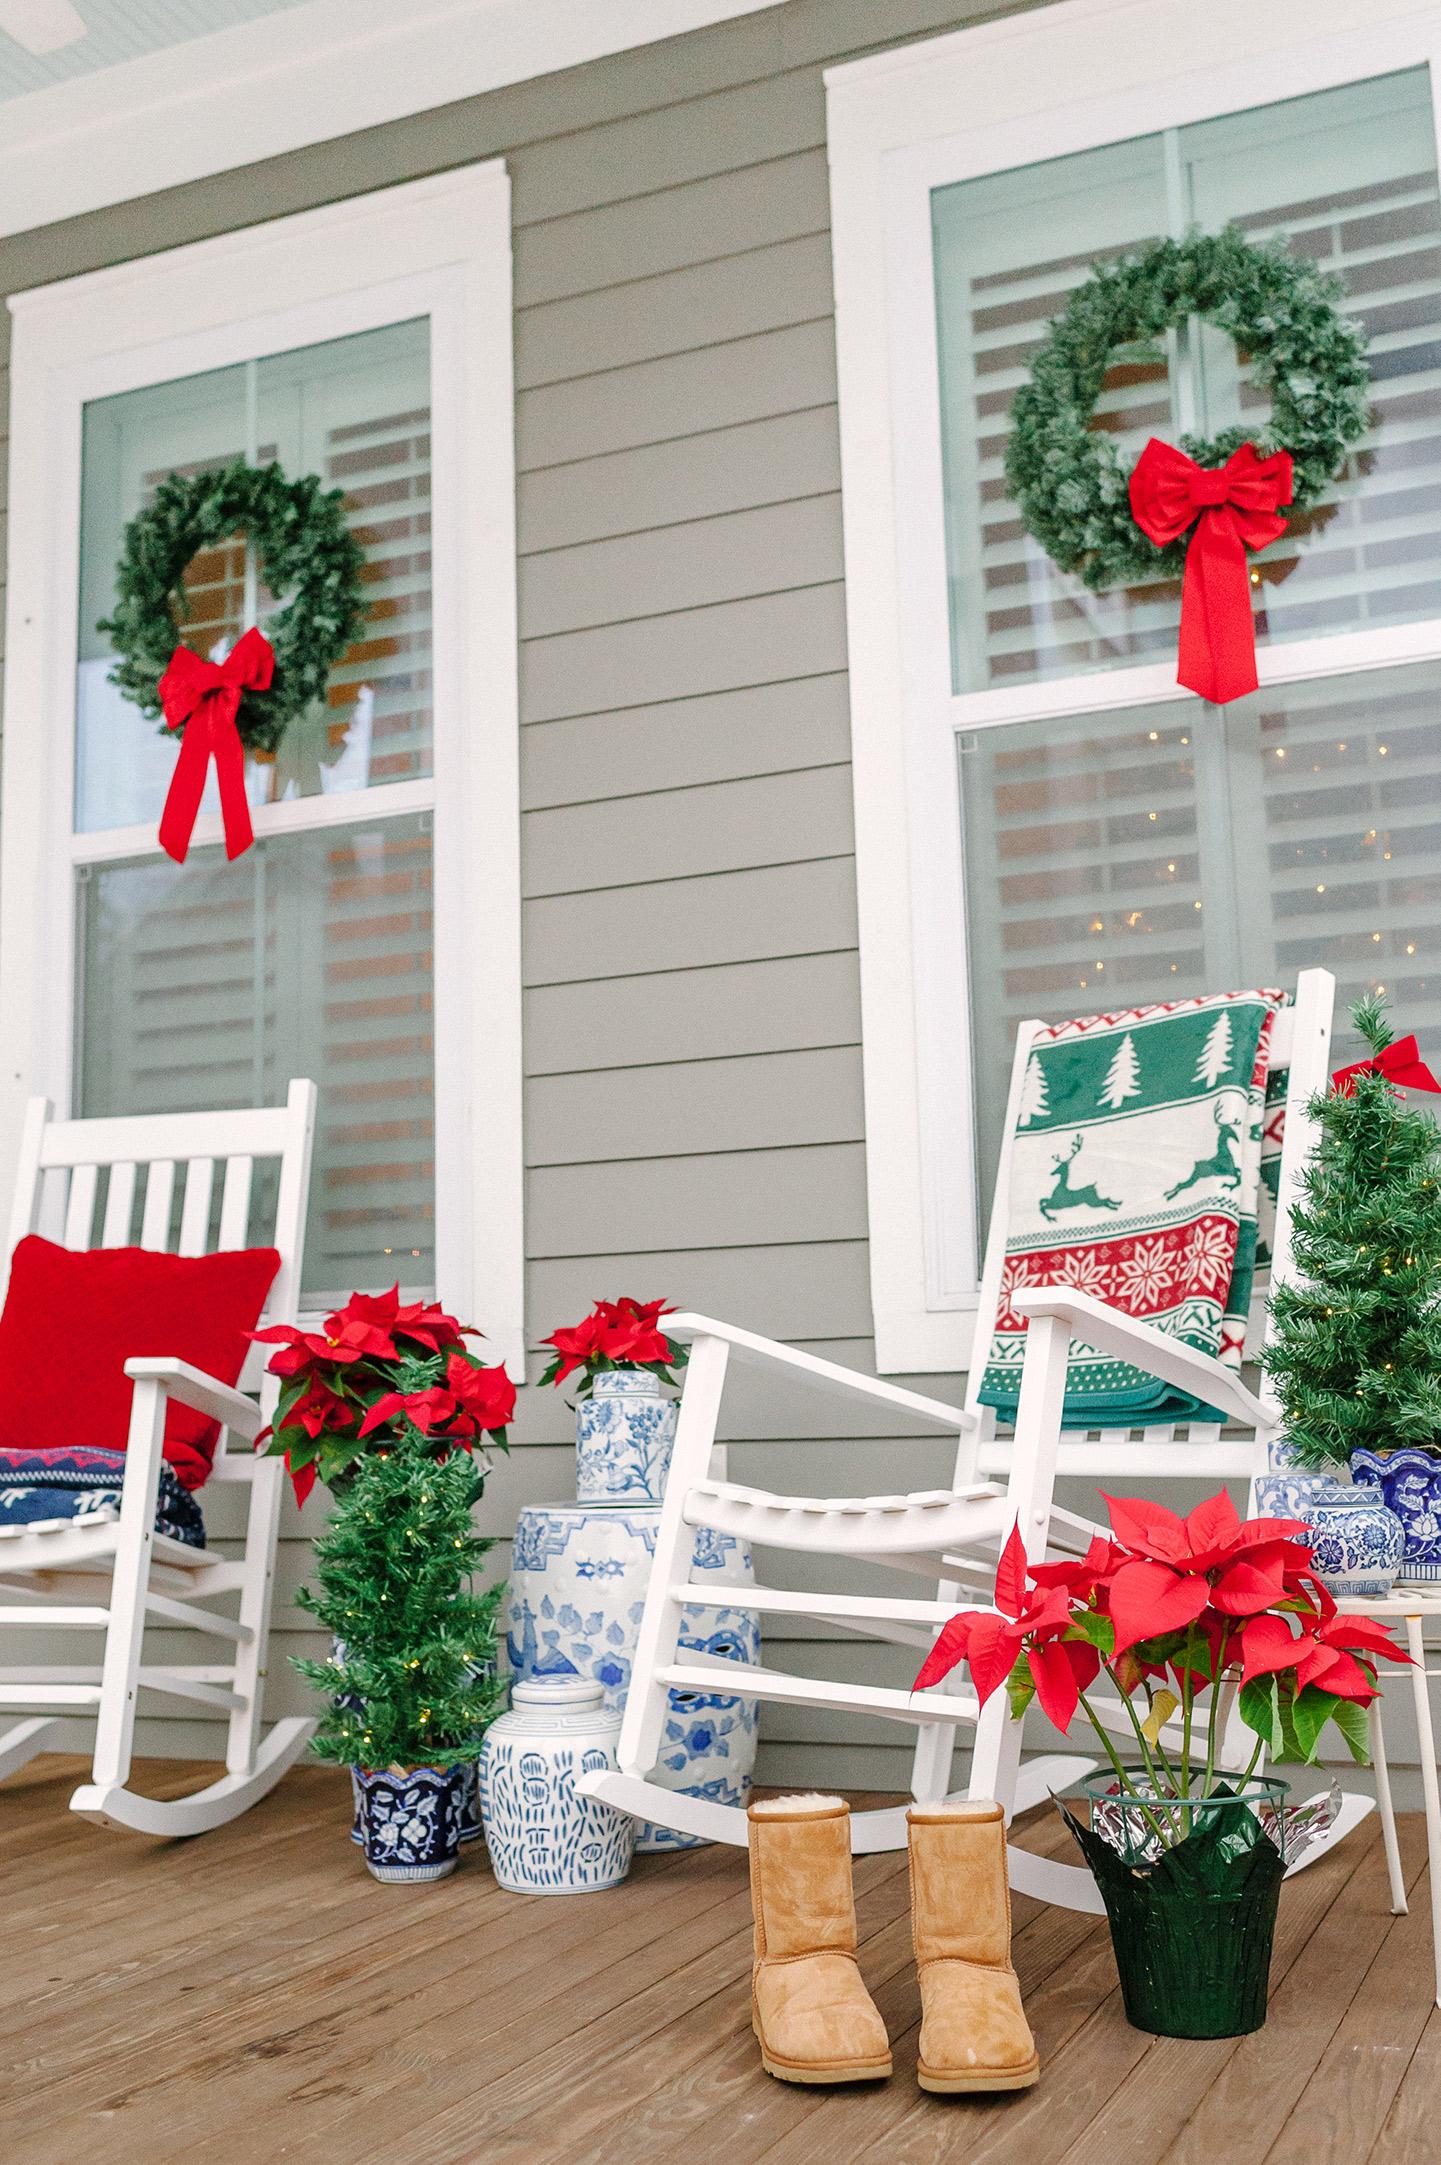 ChappyWrap Holiday Blankies to Love